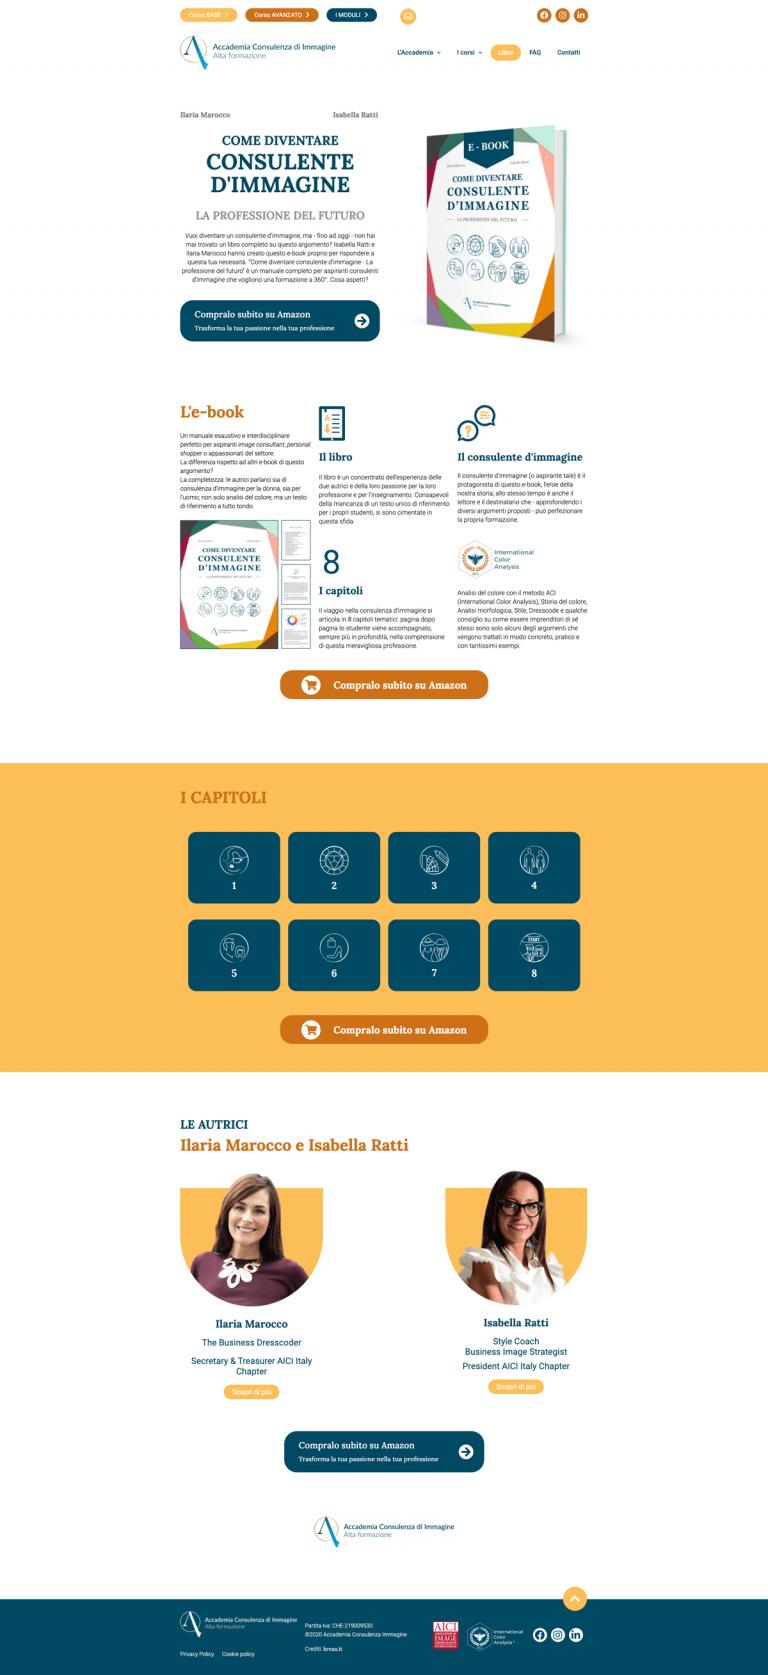 Kreas website accademiaconsulenzaimmagine e book diventare consulente dimmagine